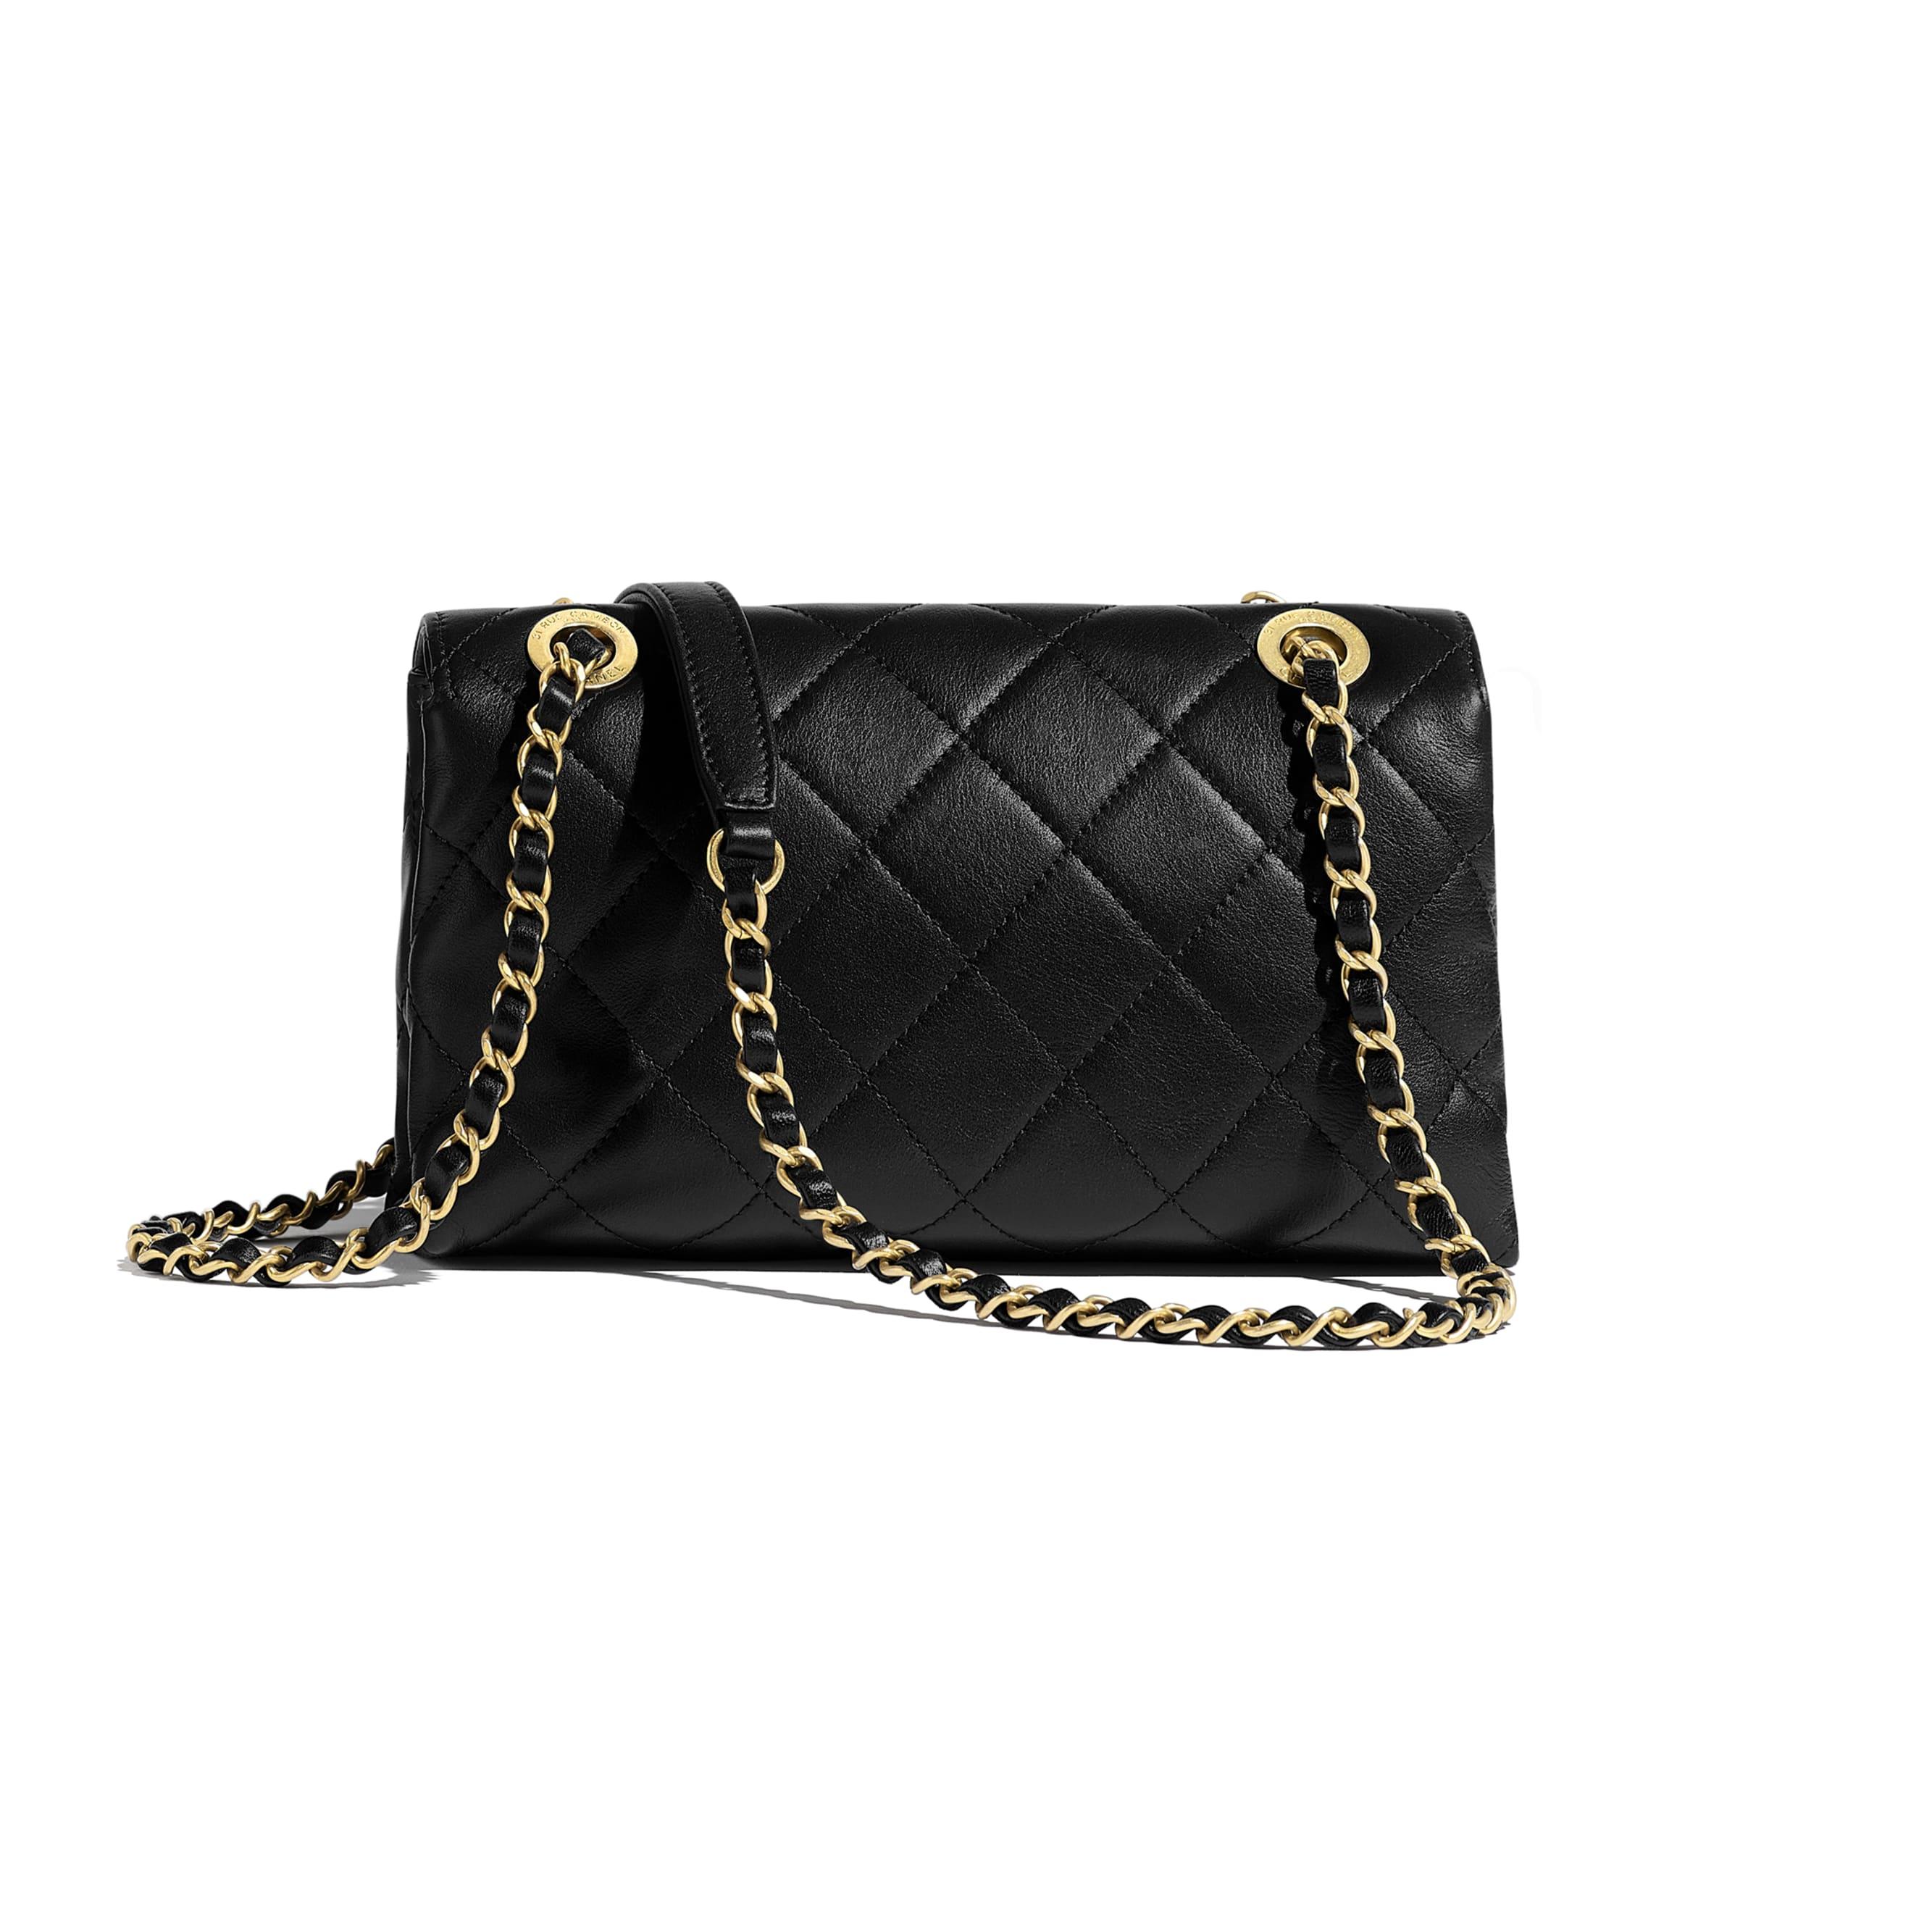 Small Flap Bag - Black - Calfskin & Gold-Tone Metal - CHANEL - Alternative view - see standard sized version